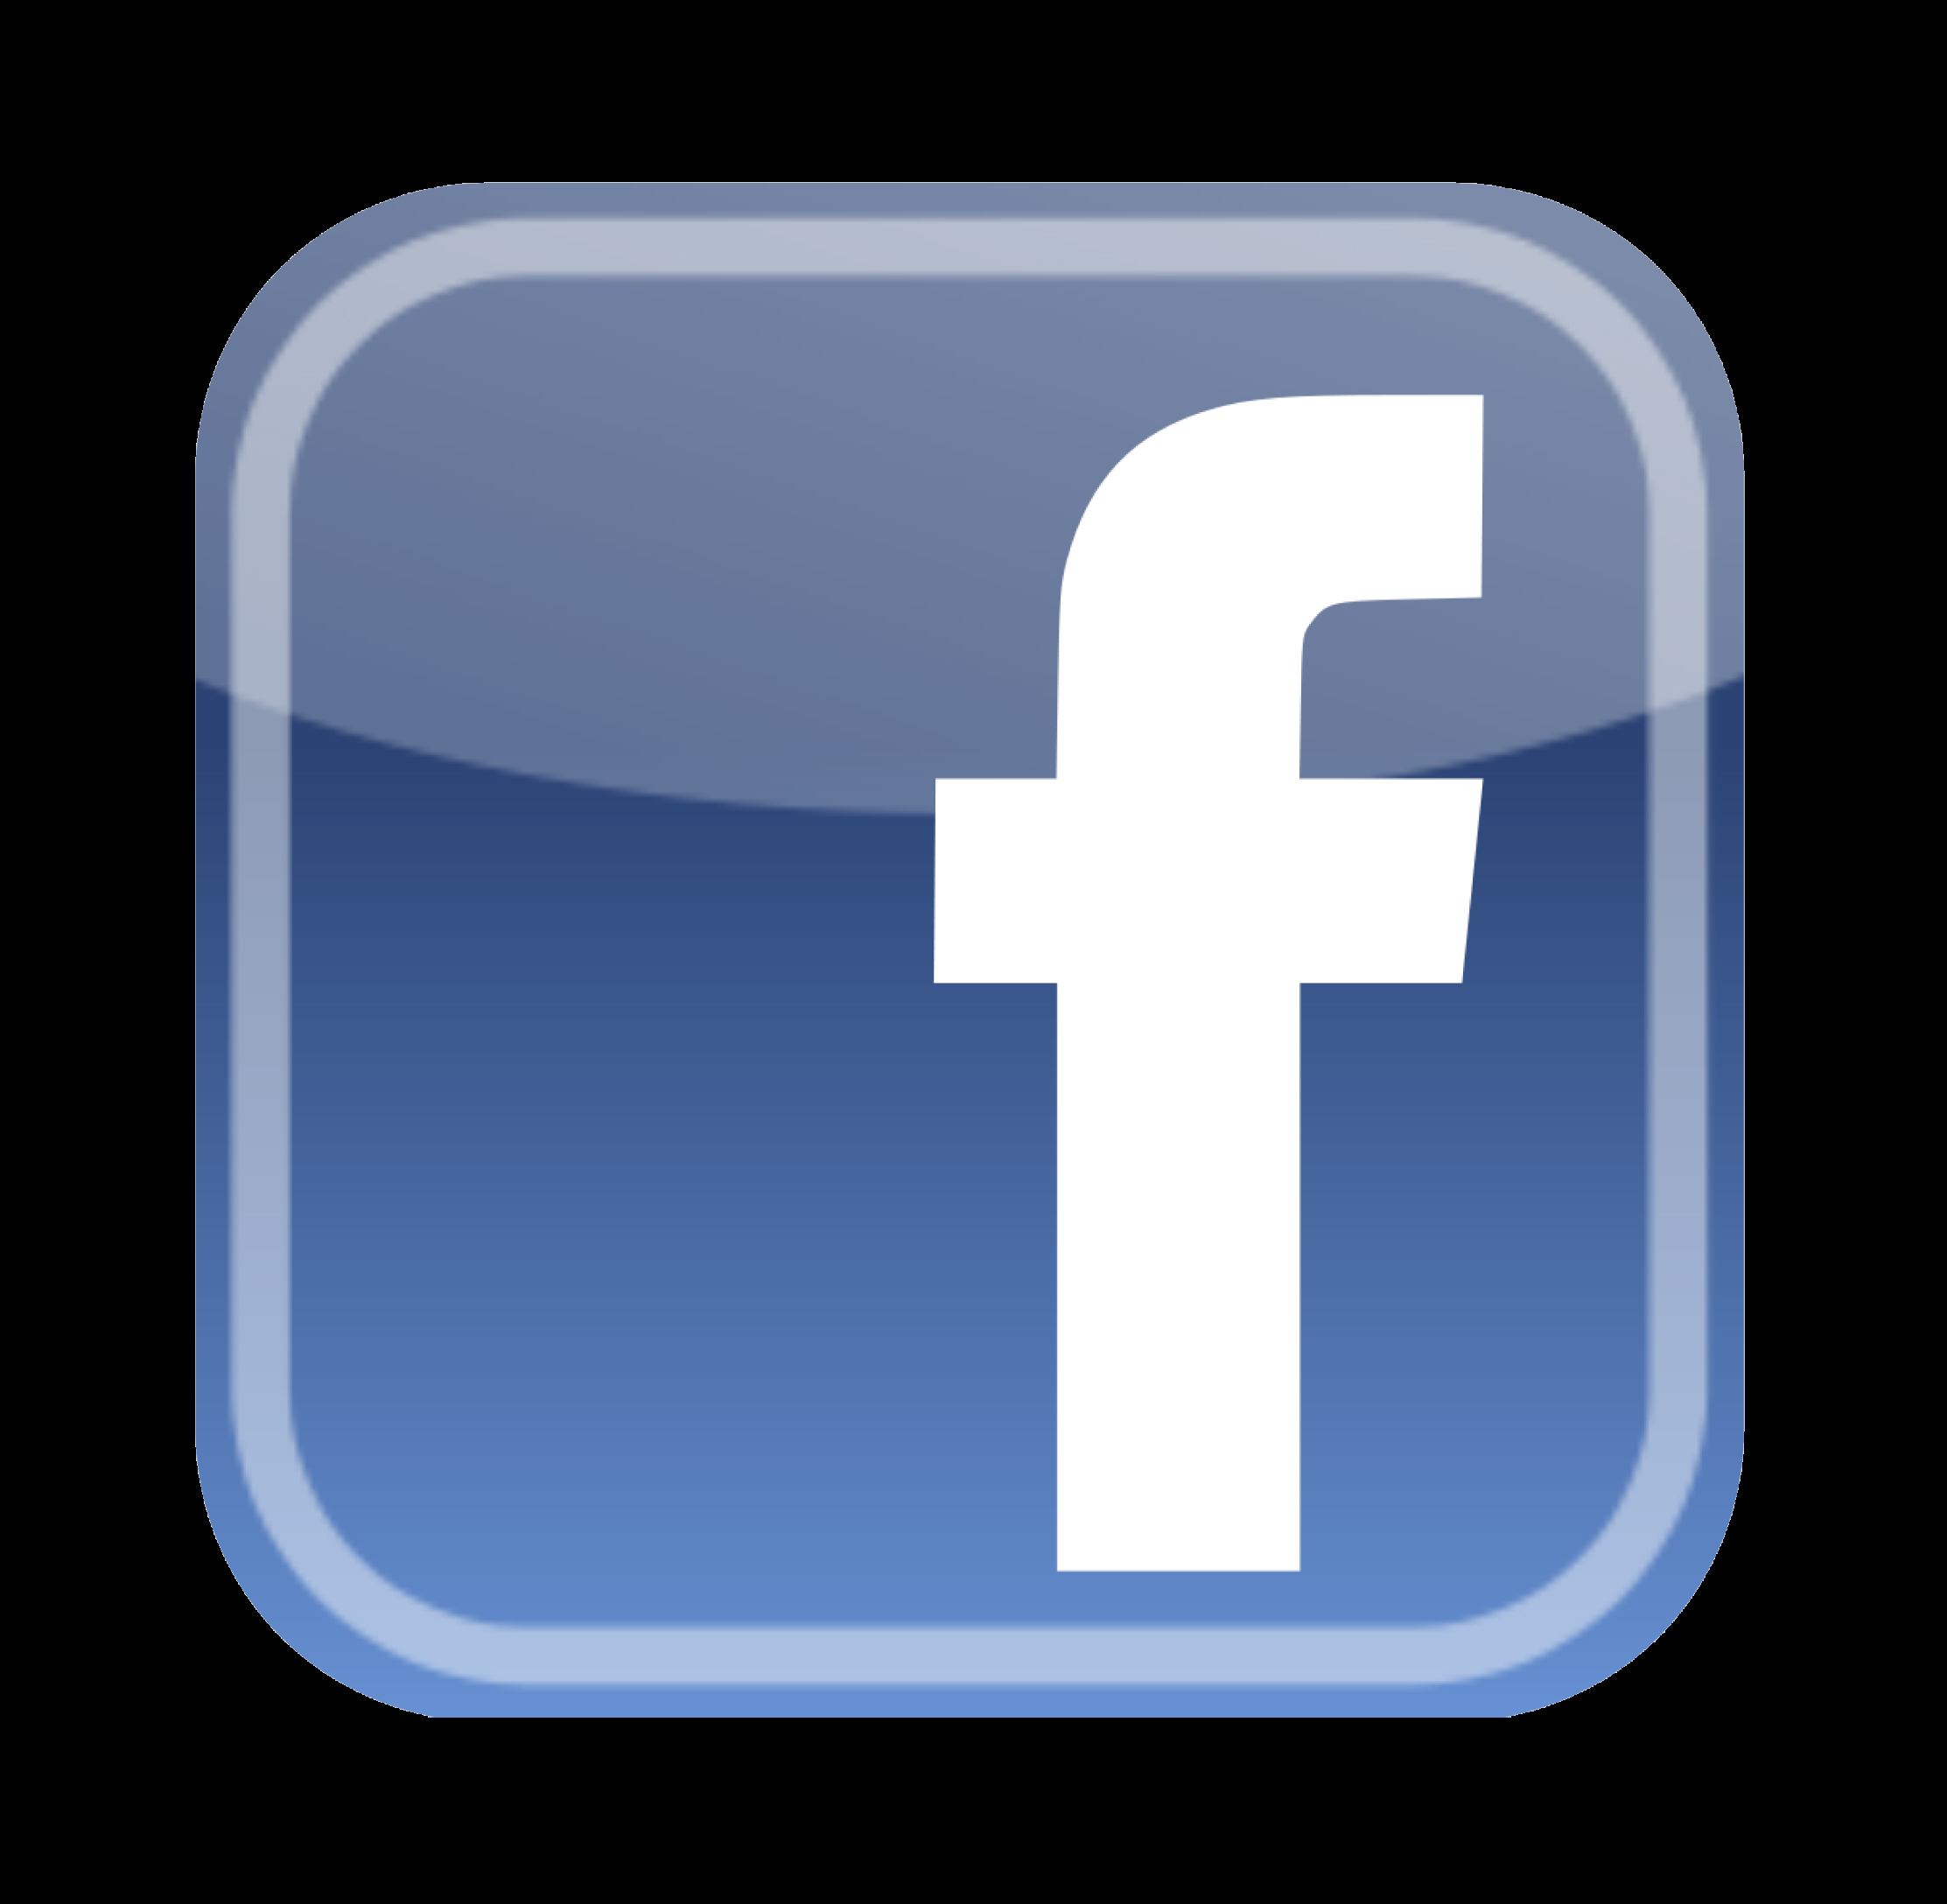 KITION PLANETARIUM & OBSERVATORY Facebook Group